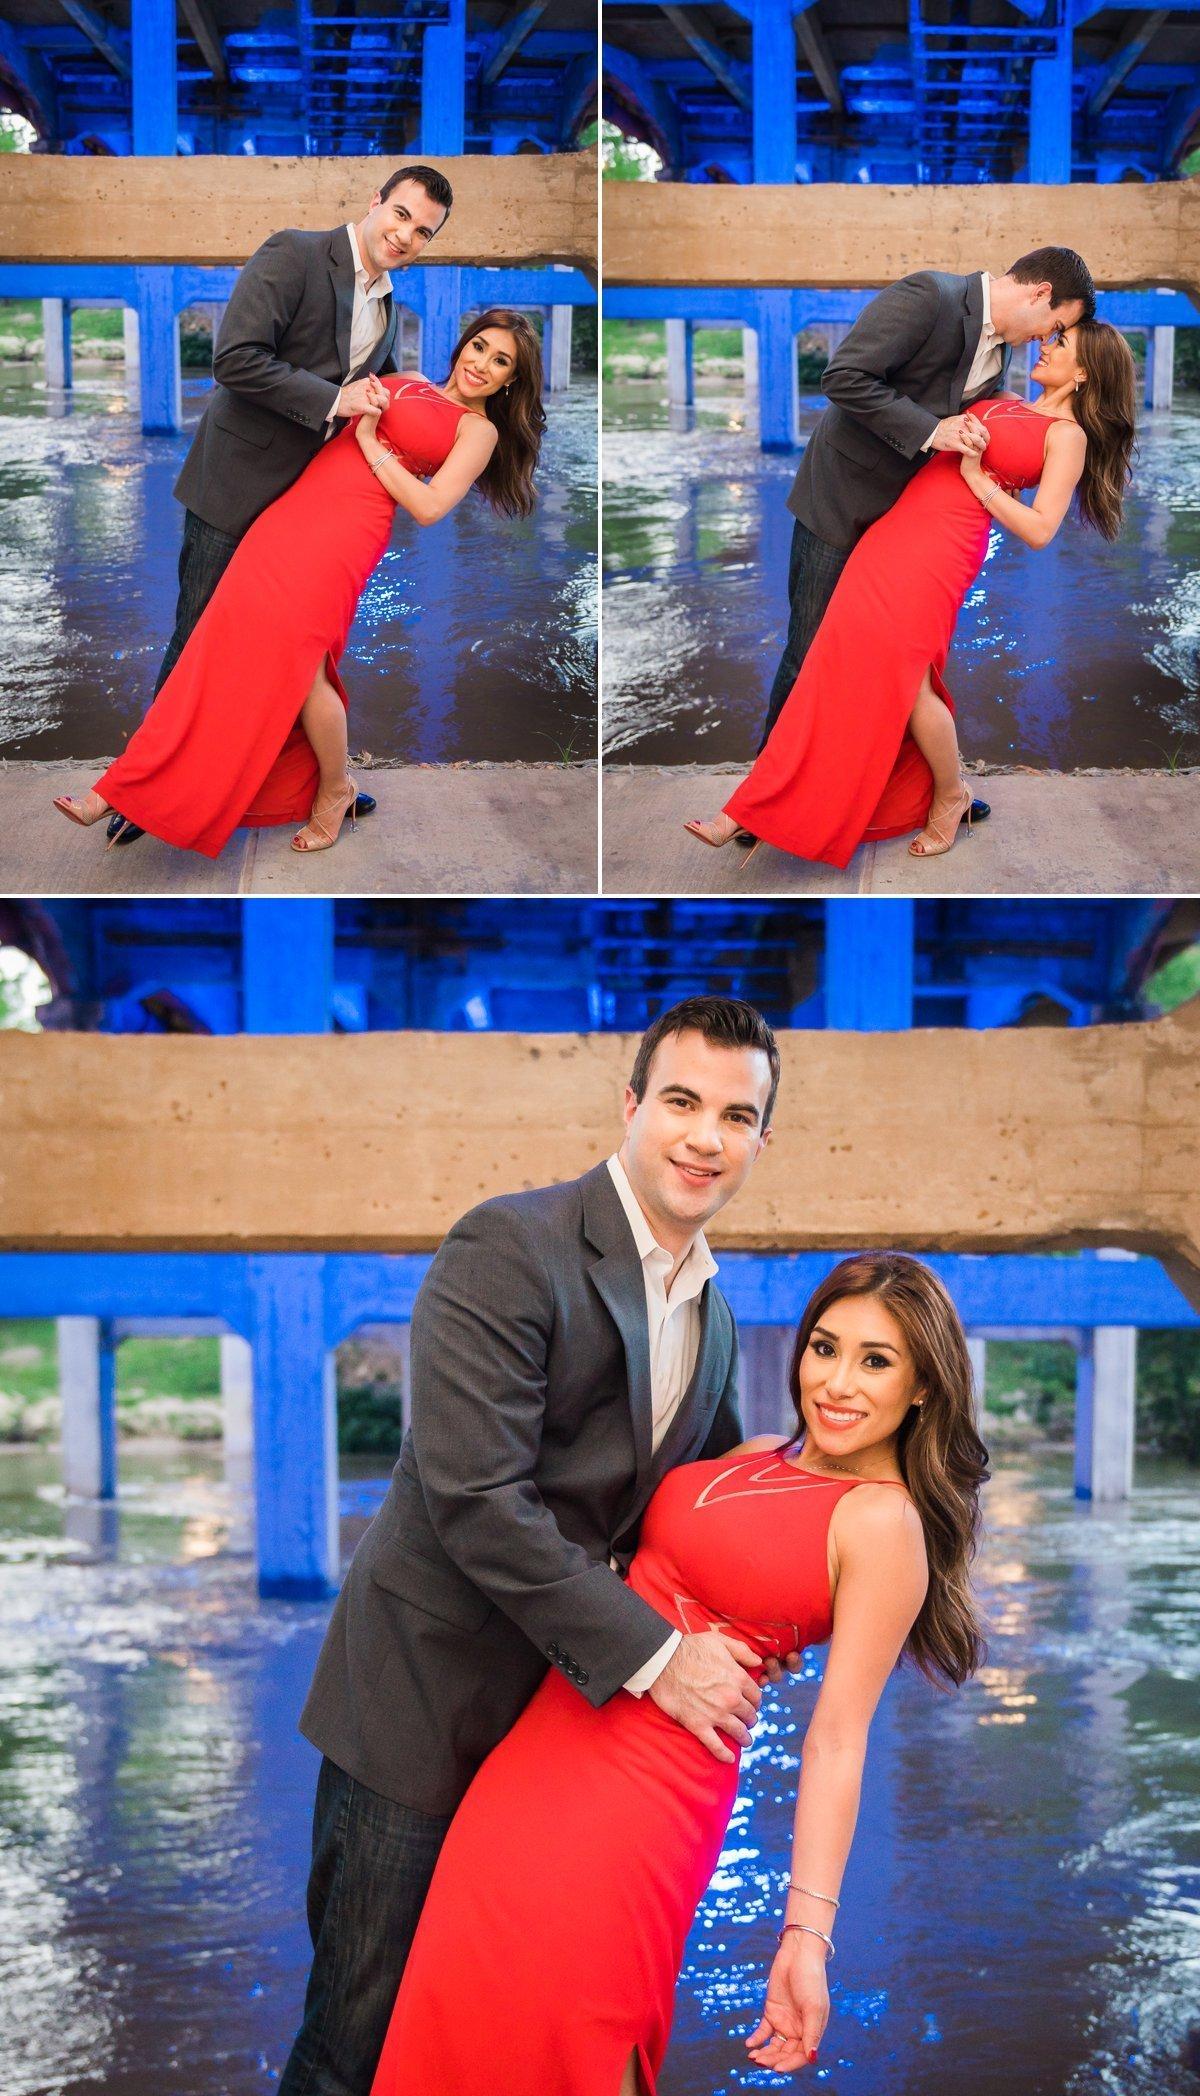 Brenda & Marco Engagement Blog 14